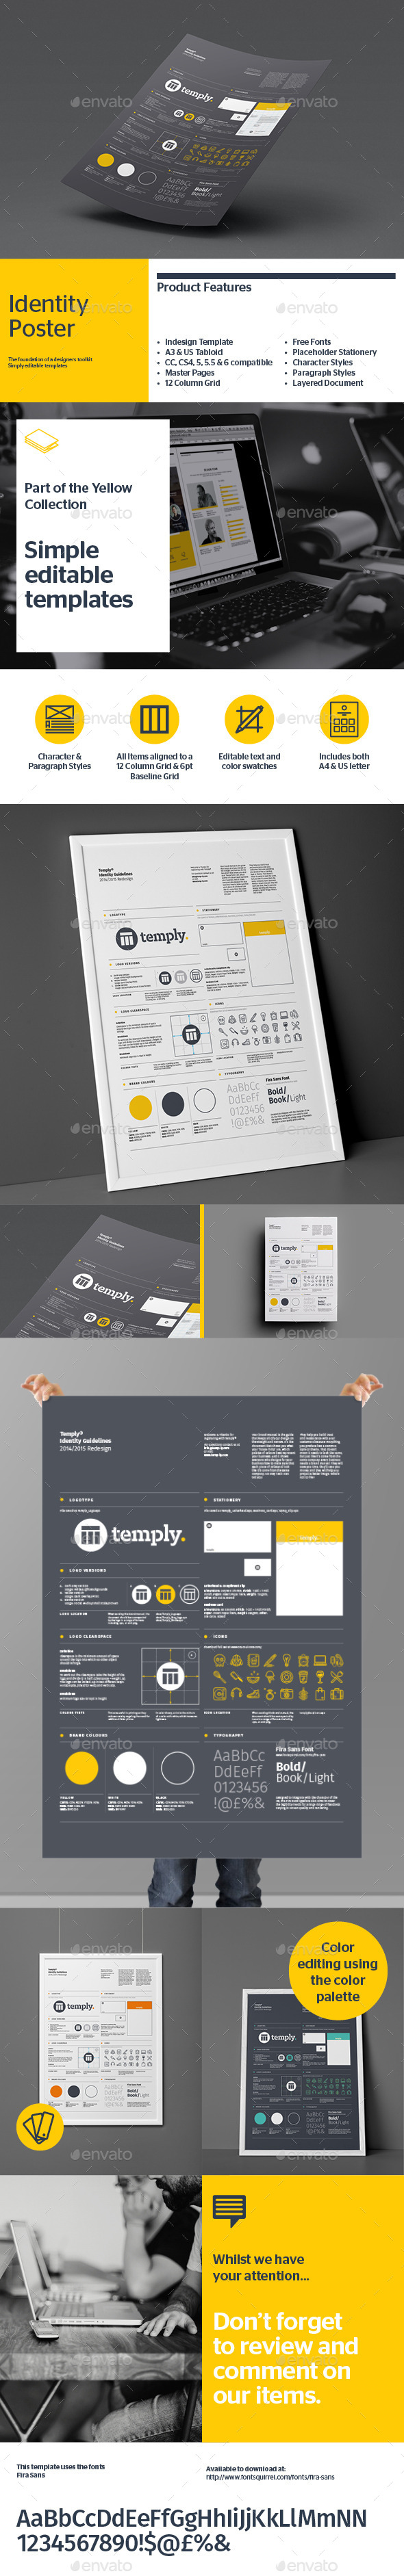 GraphicRiver Brand Identity Poster 9242135